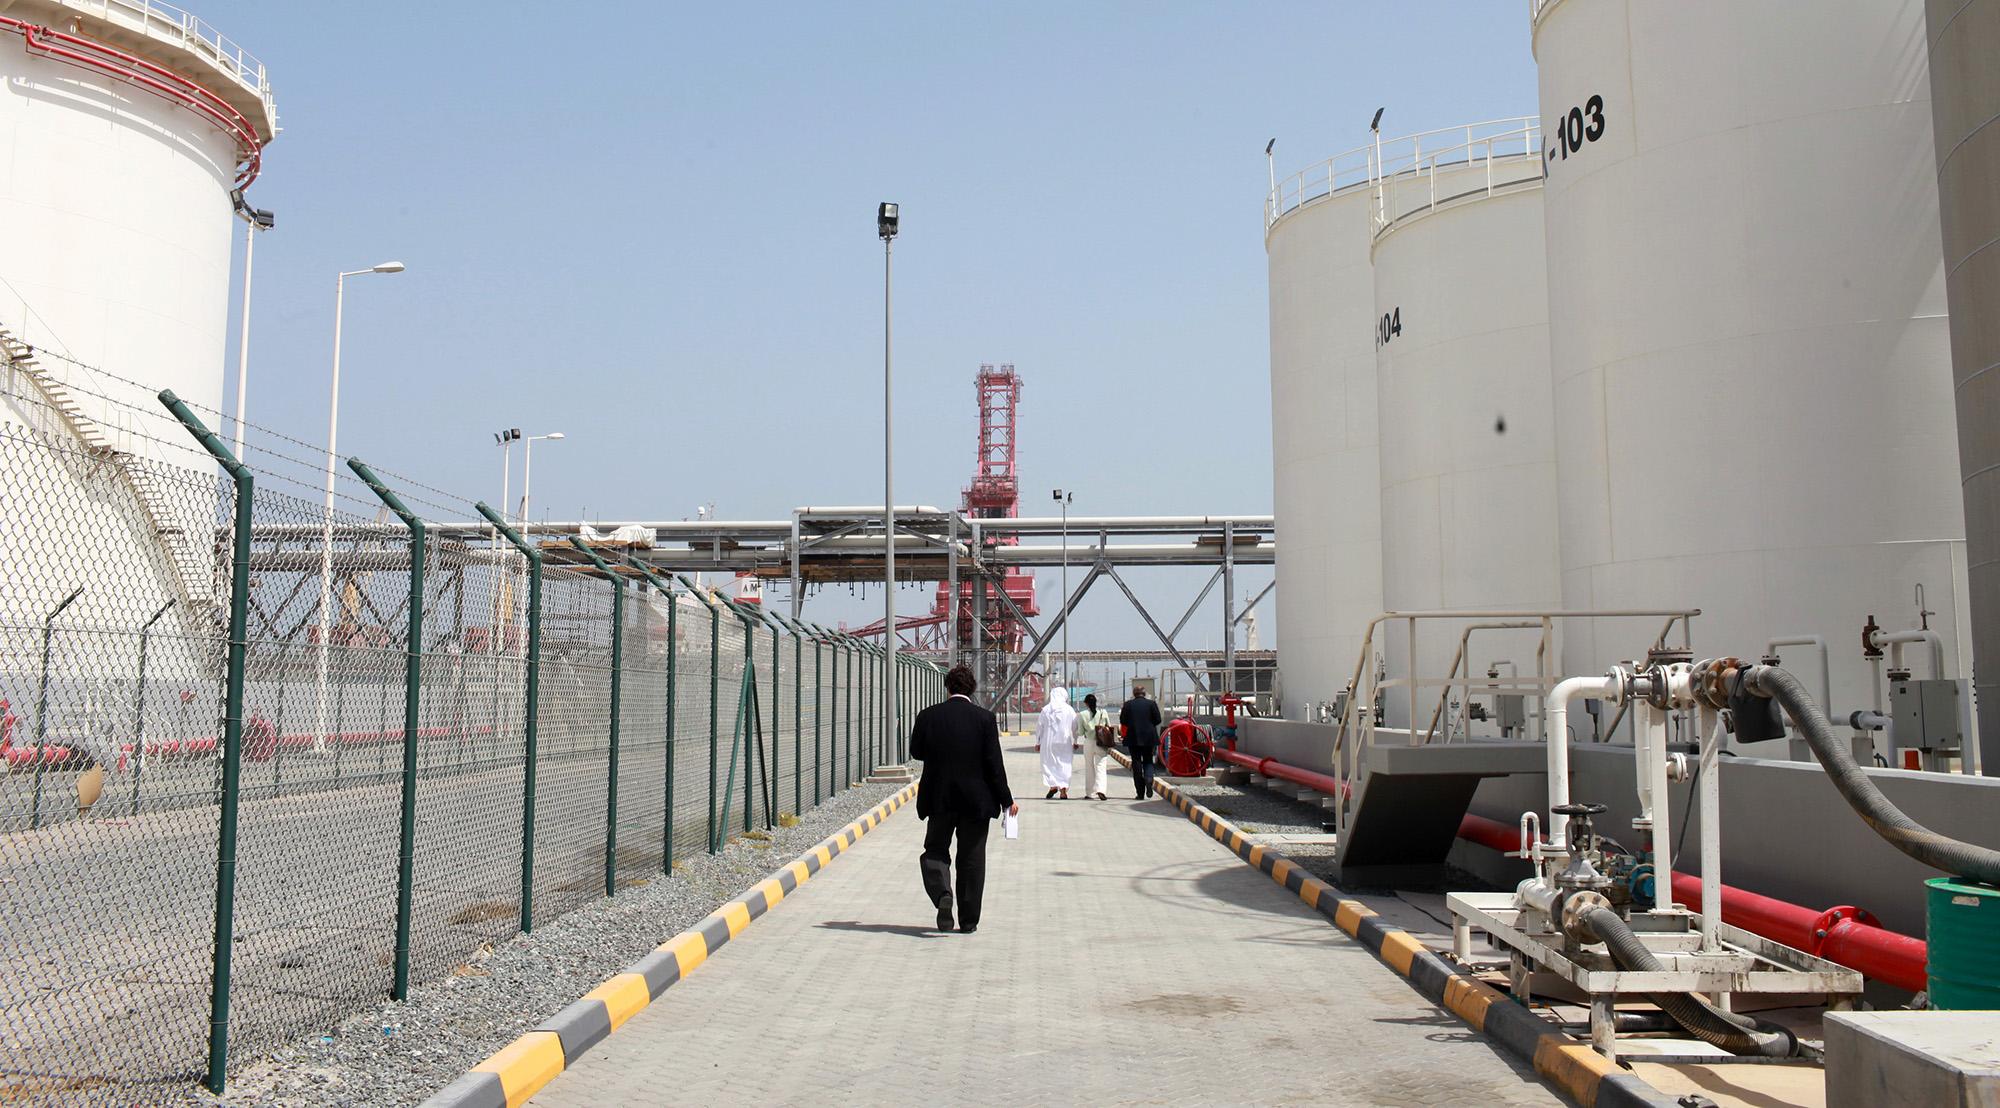 Brooge Petroleum & Gas to List on Nasdaq in Reverse Merger